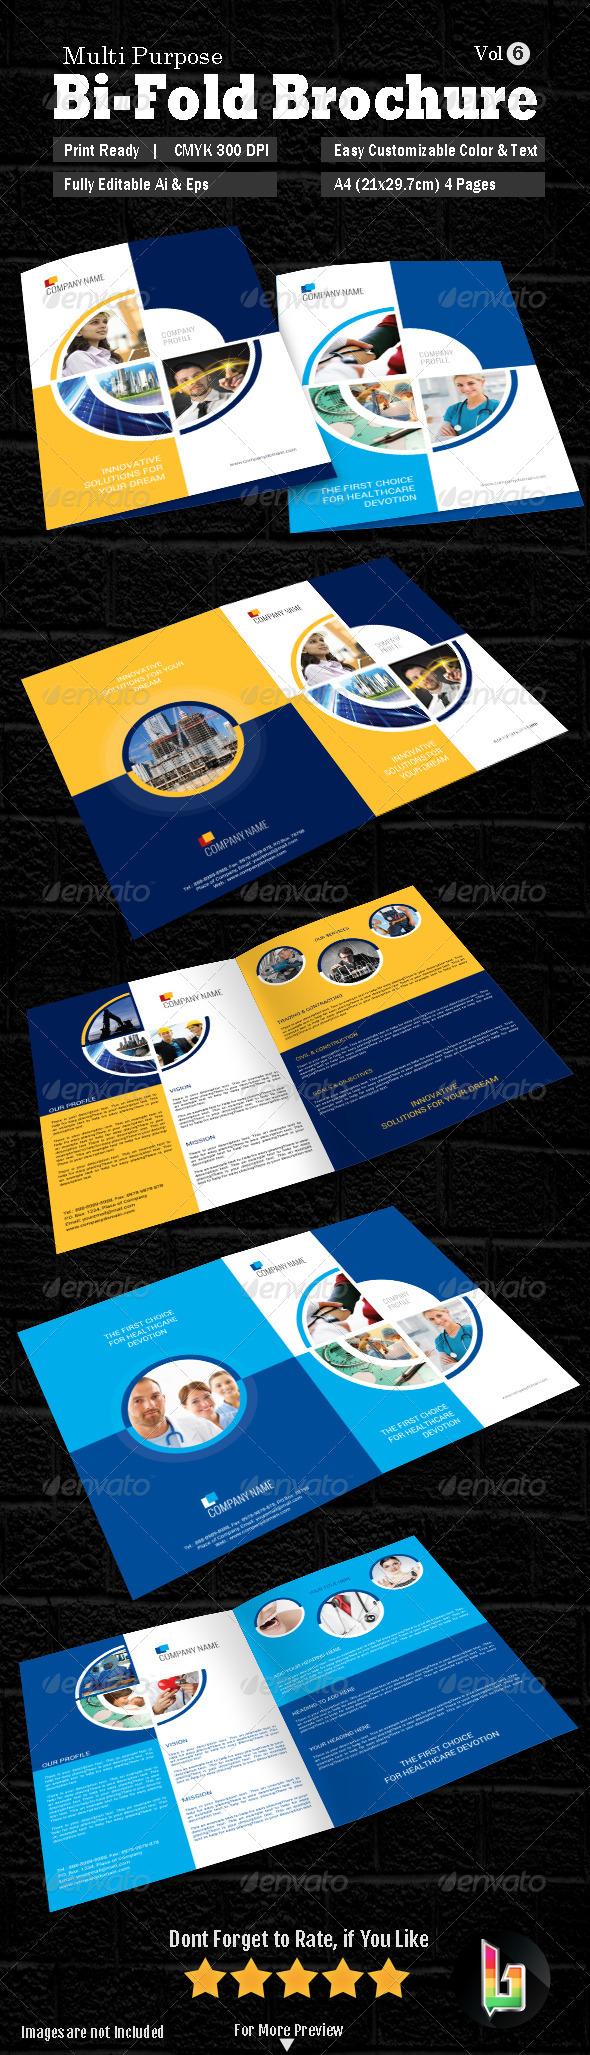 GraphicRiver Multipurpose Bi-fold Brochure Vol-6 8161635